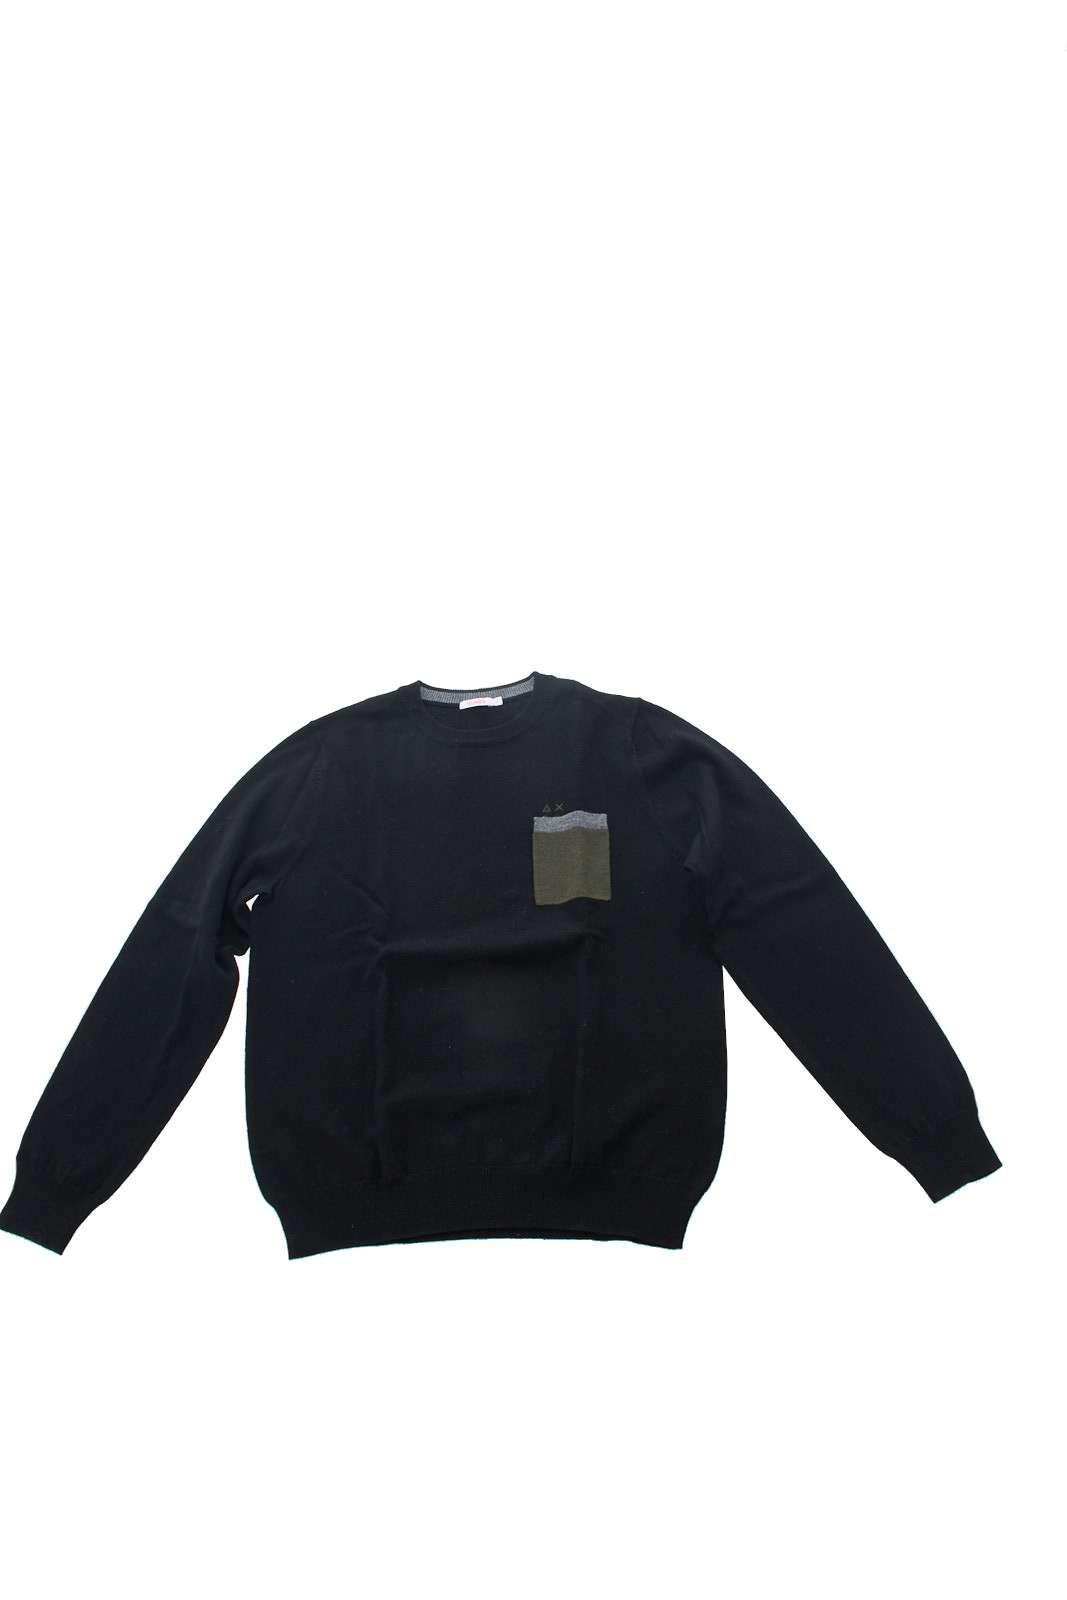 https://www.parmax.com/media/catalog/product/a/i/AI-outle_parmax-maglia-bambino-sun%2068-26355-A.jpg